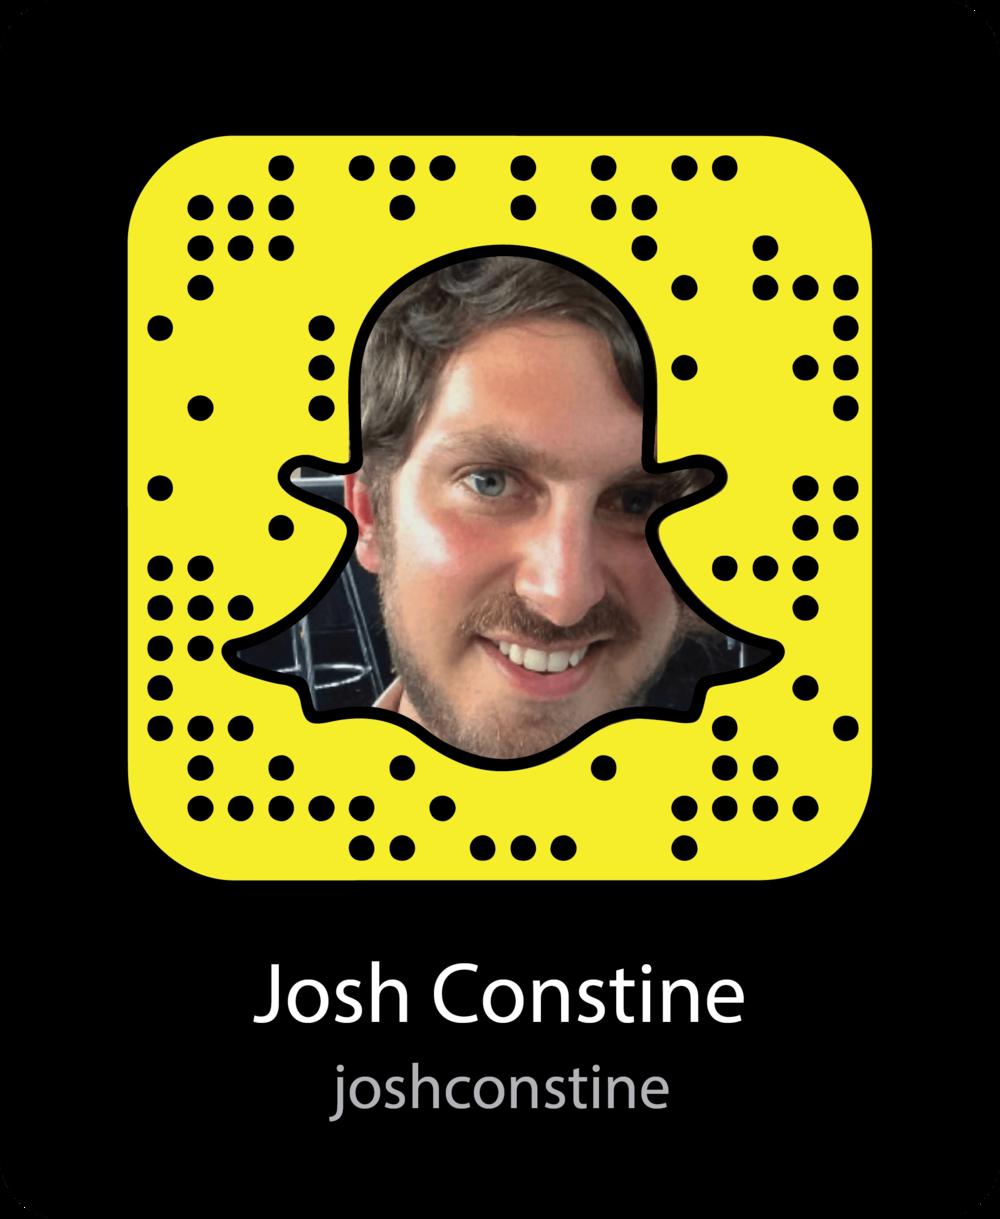 josh-constine-storytellers-snapchat-snapcode.png